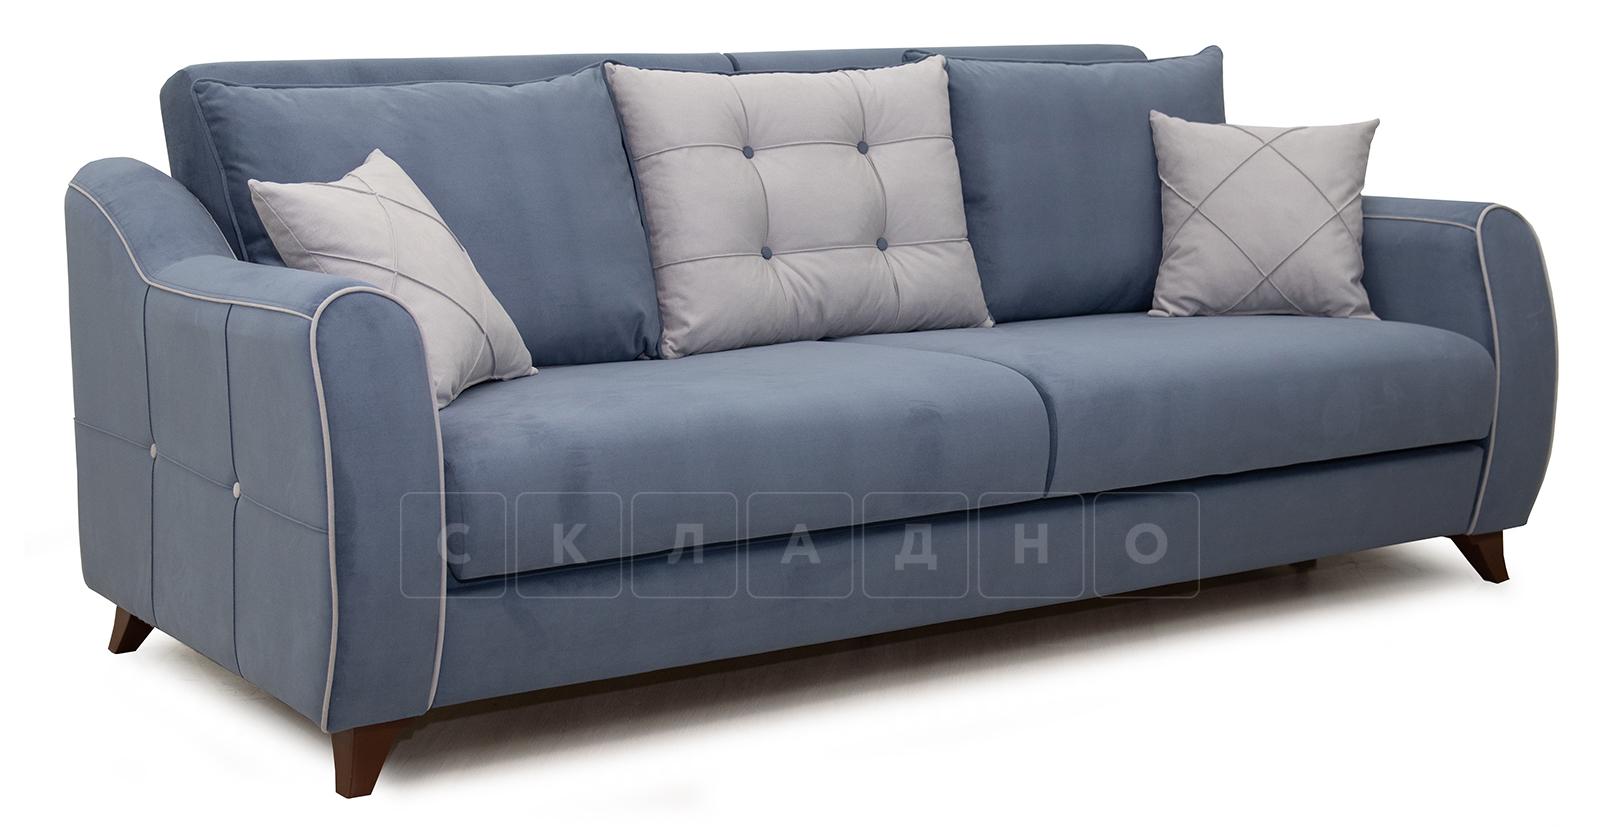 Диван-кровать Флэтфорд серо-синий фото 1 | интернет-магазин Складно